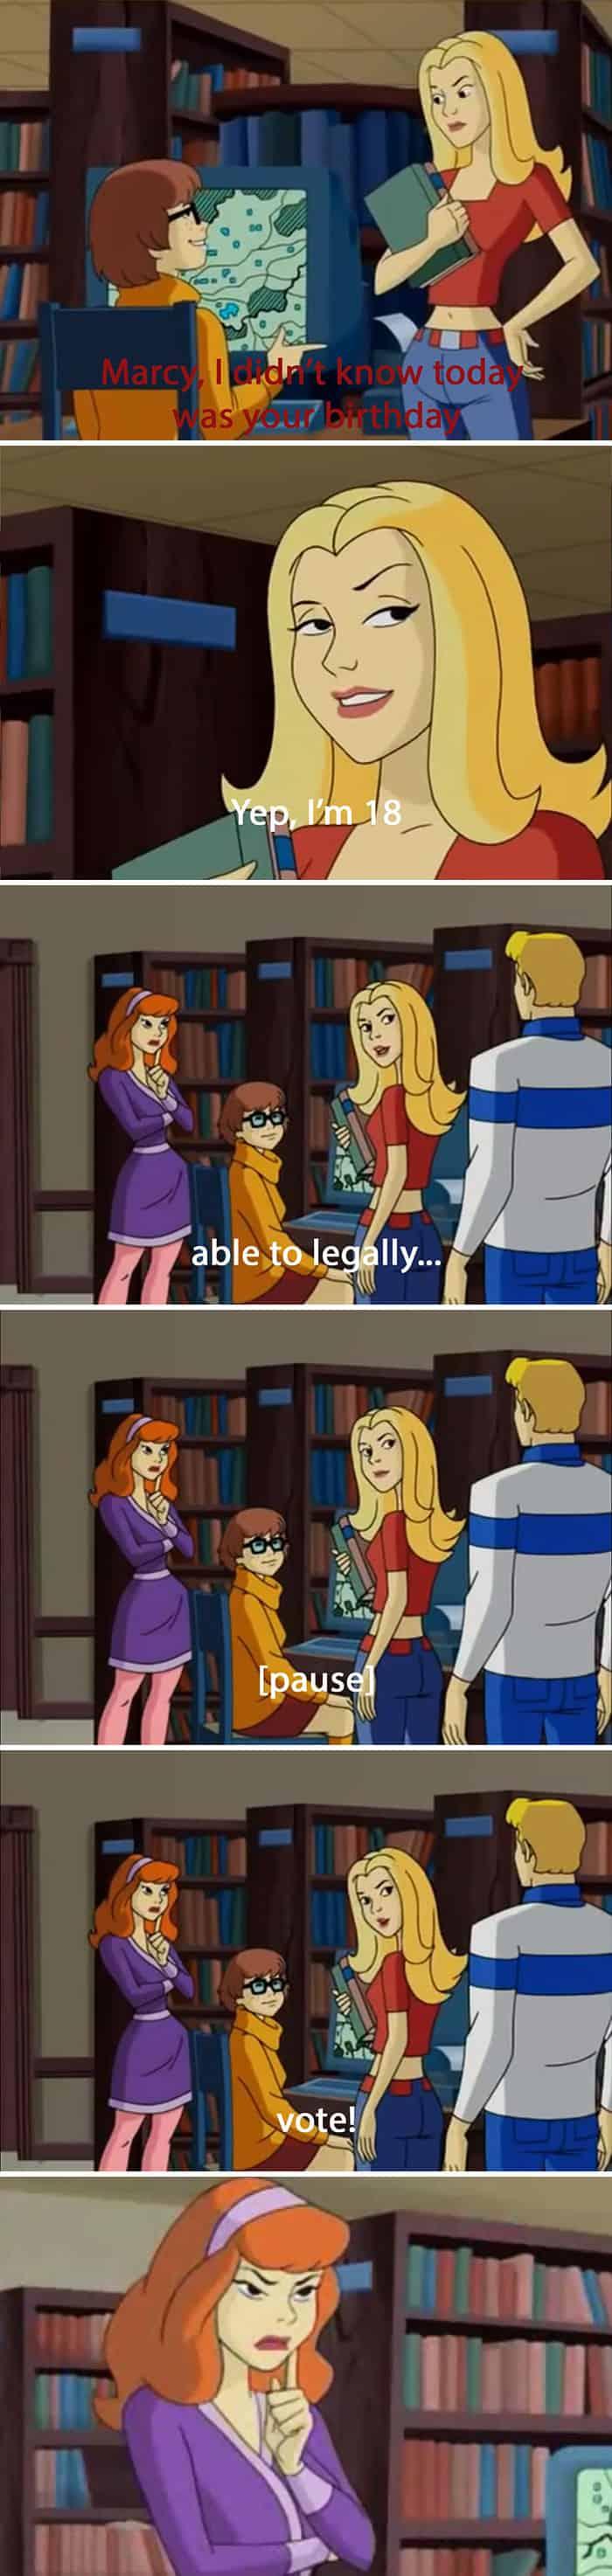 Adult Jokes Hidden In Cartoons birthday